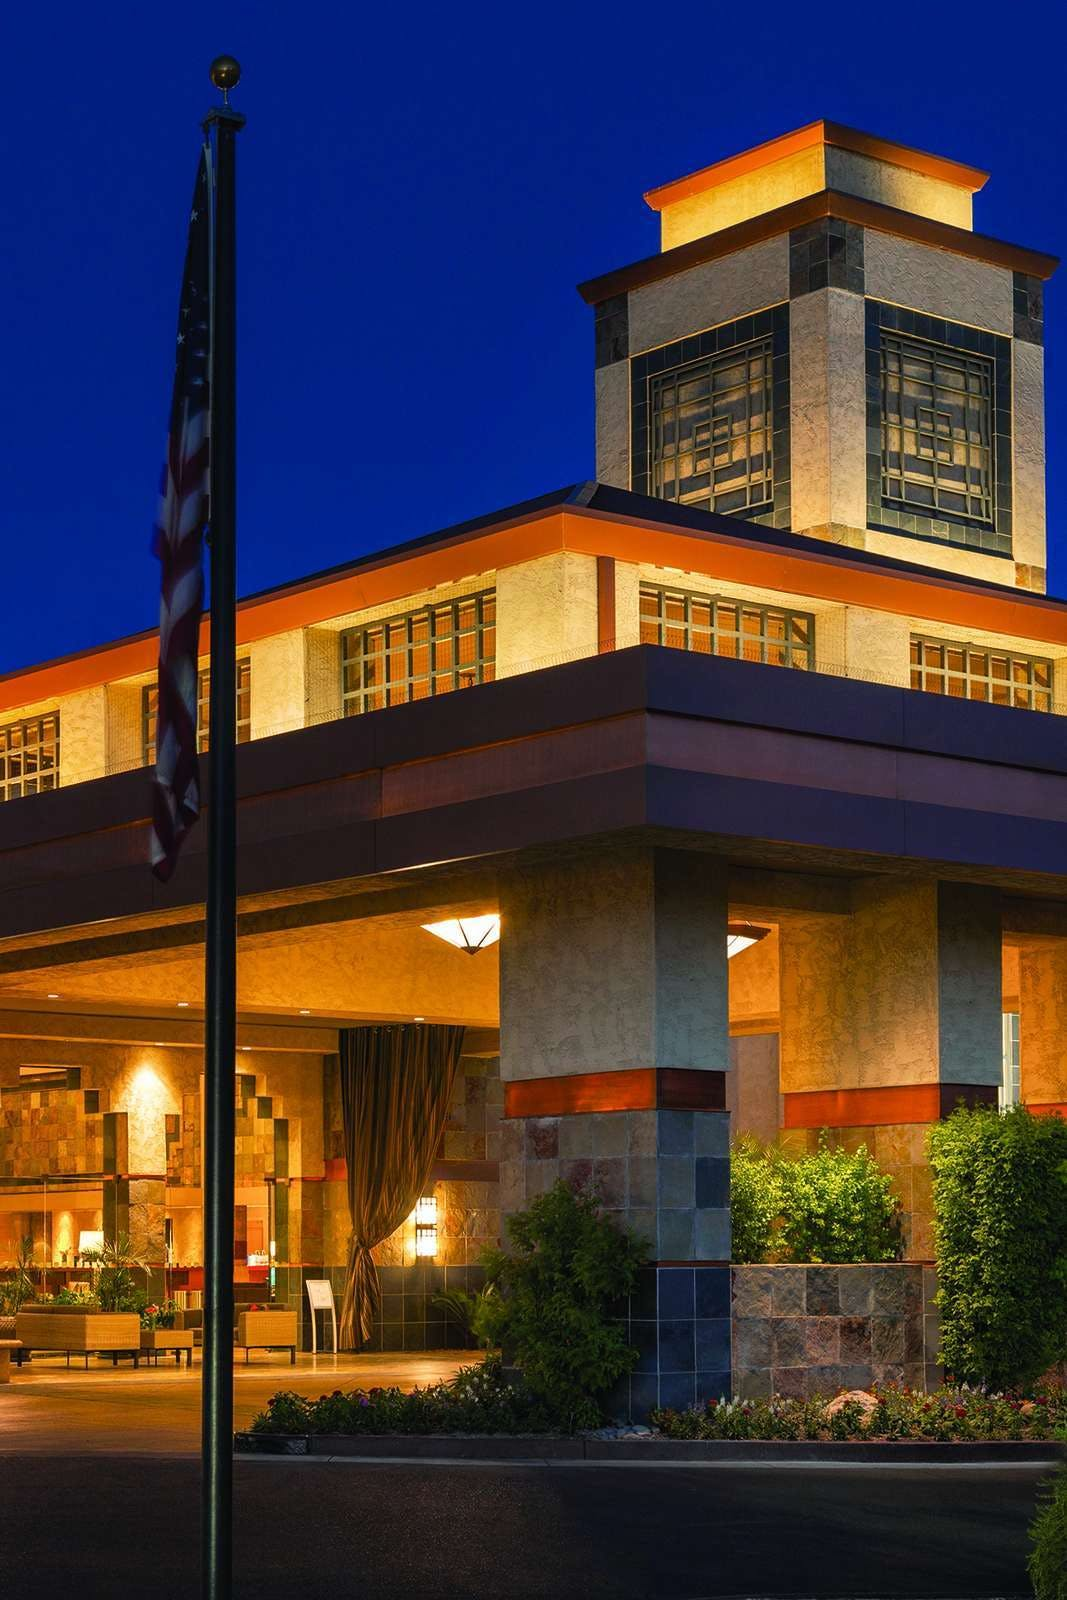 Hilton Scottsdale Resorts and Villas